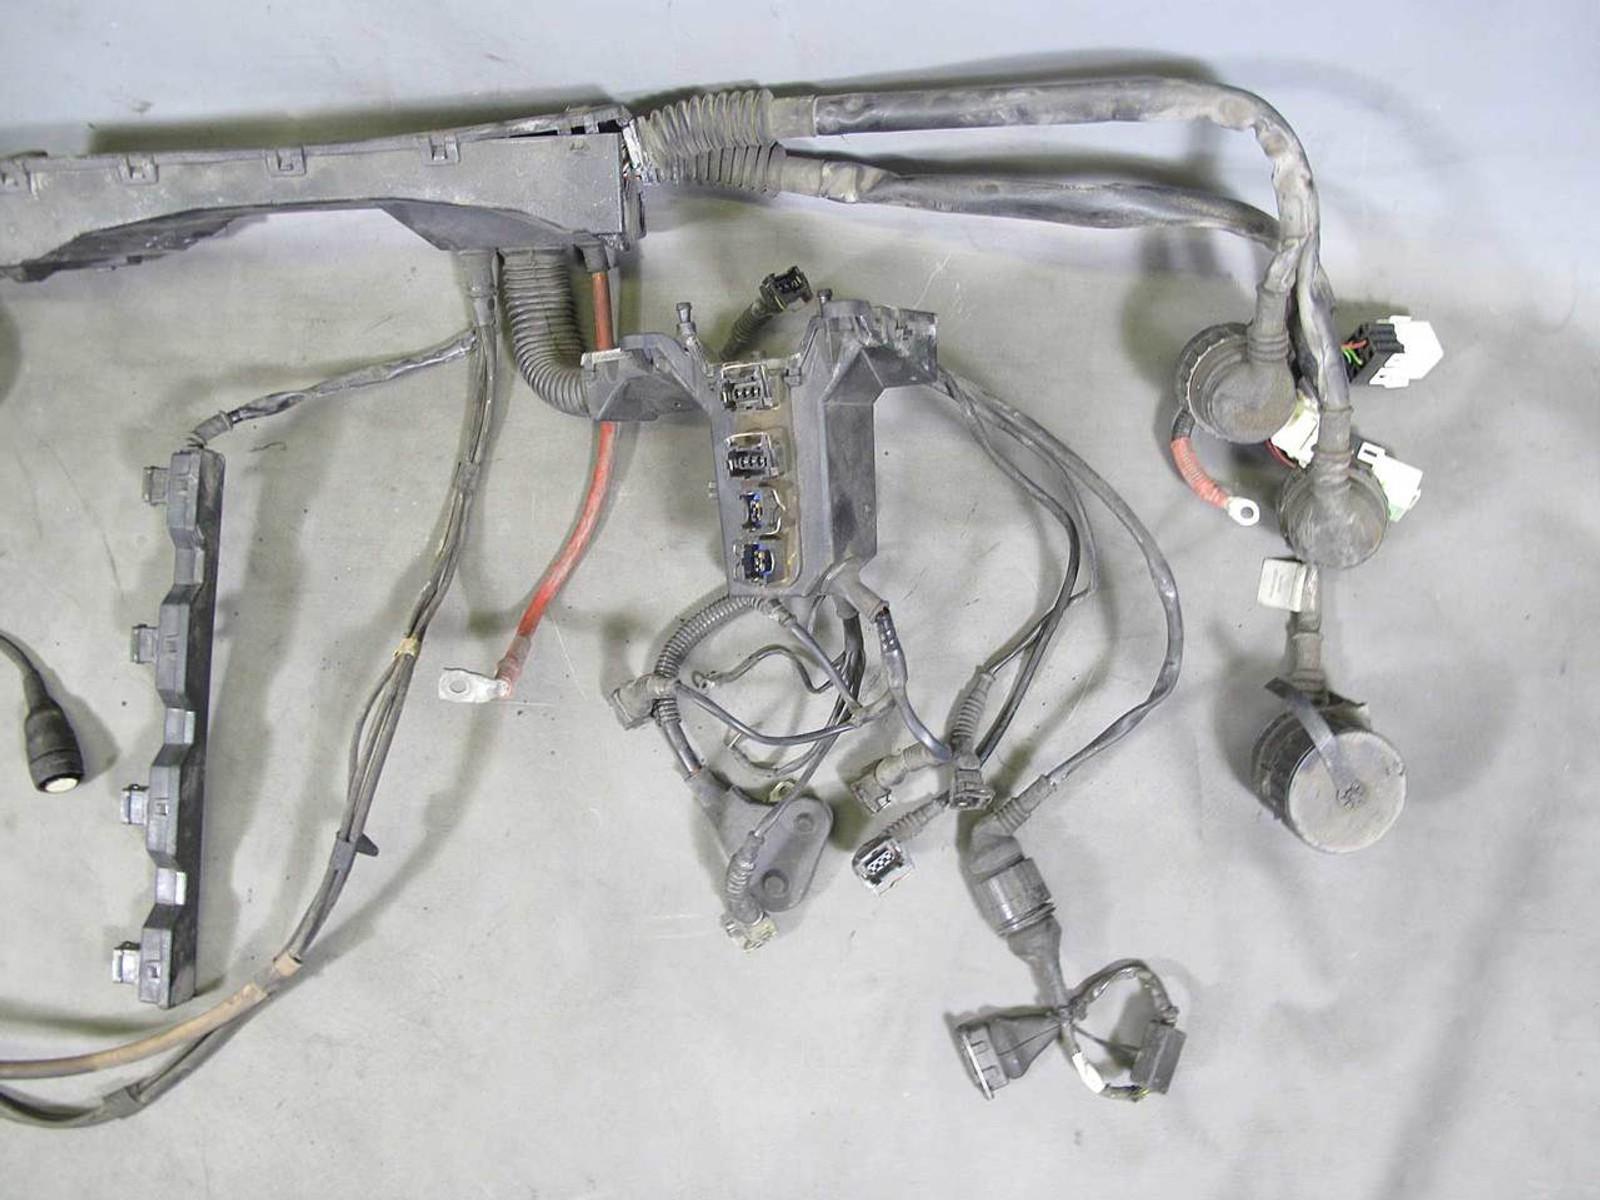 hight resolution of 1995 bmw wiring harness wiring diagram info 1995 bmw wiring harness